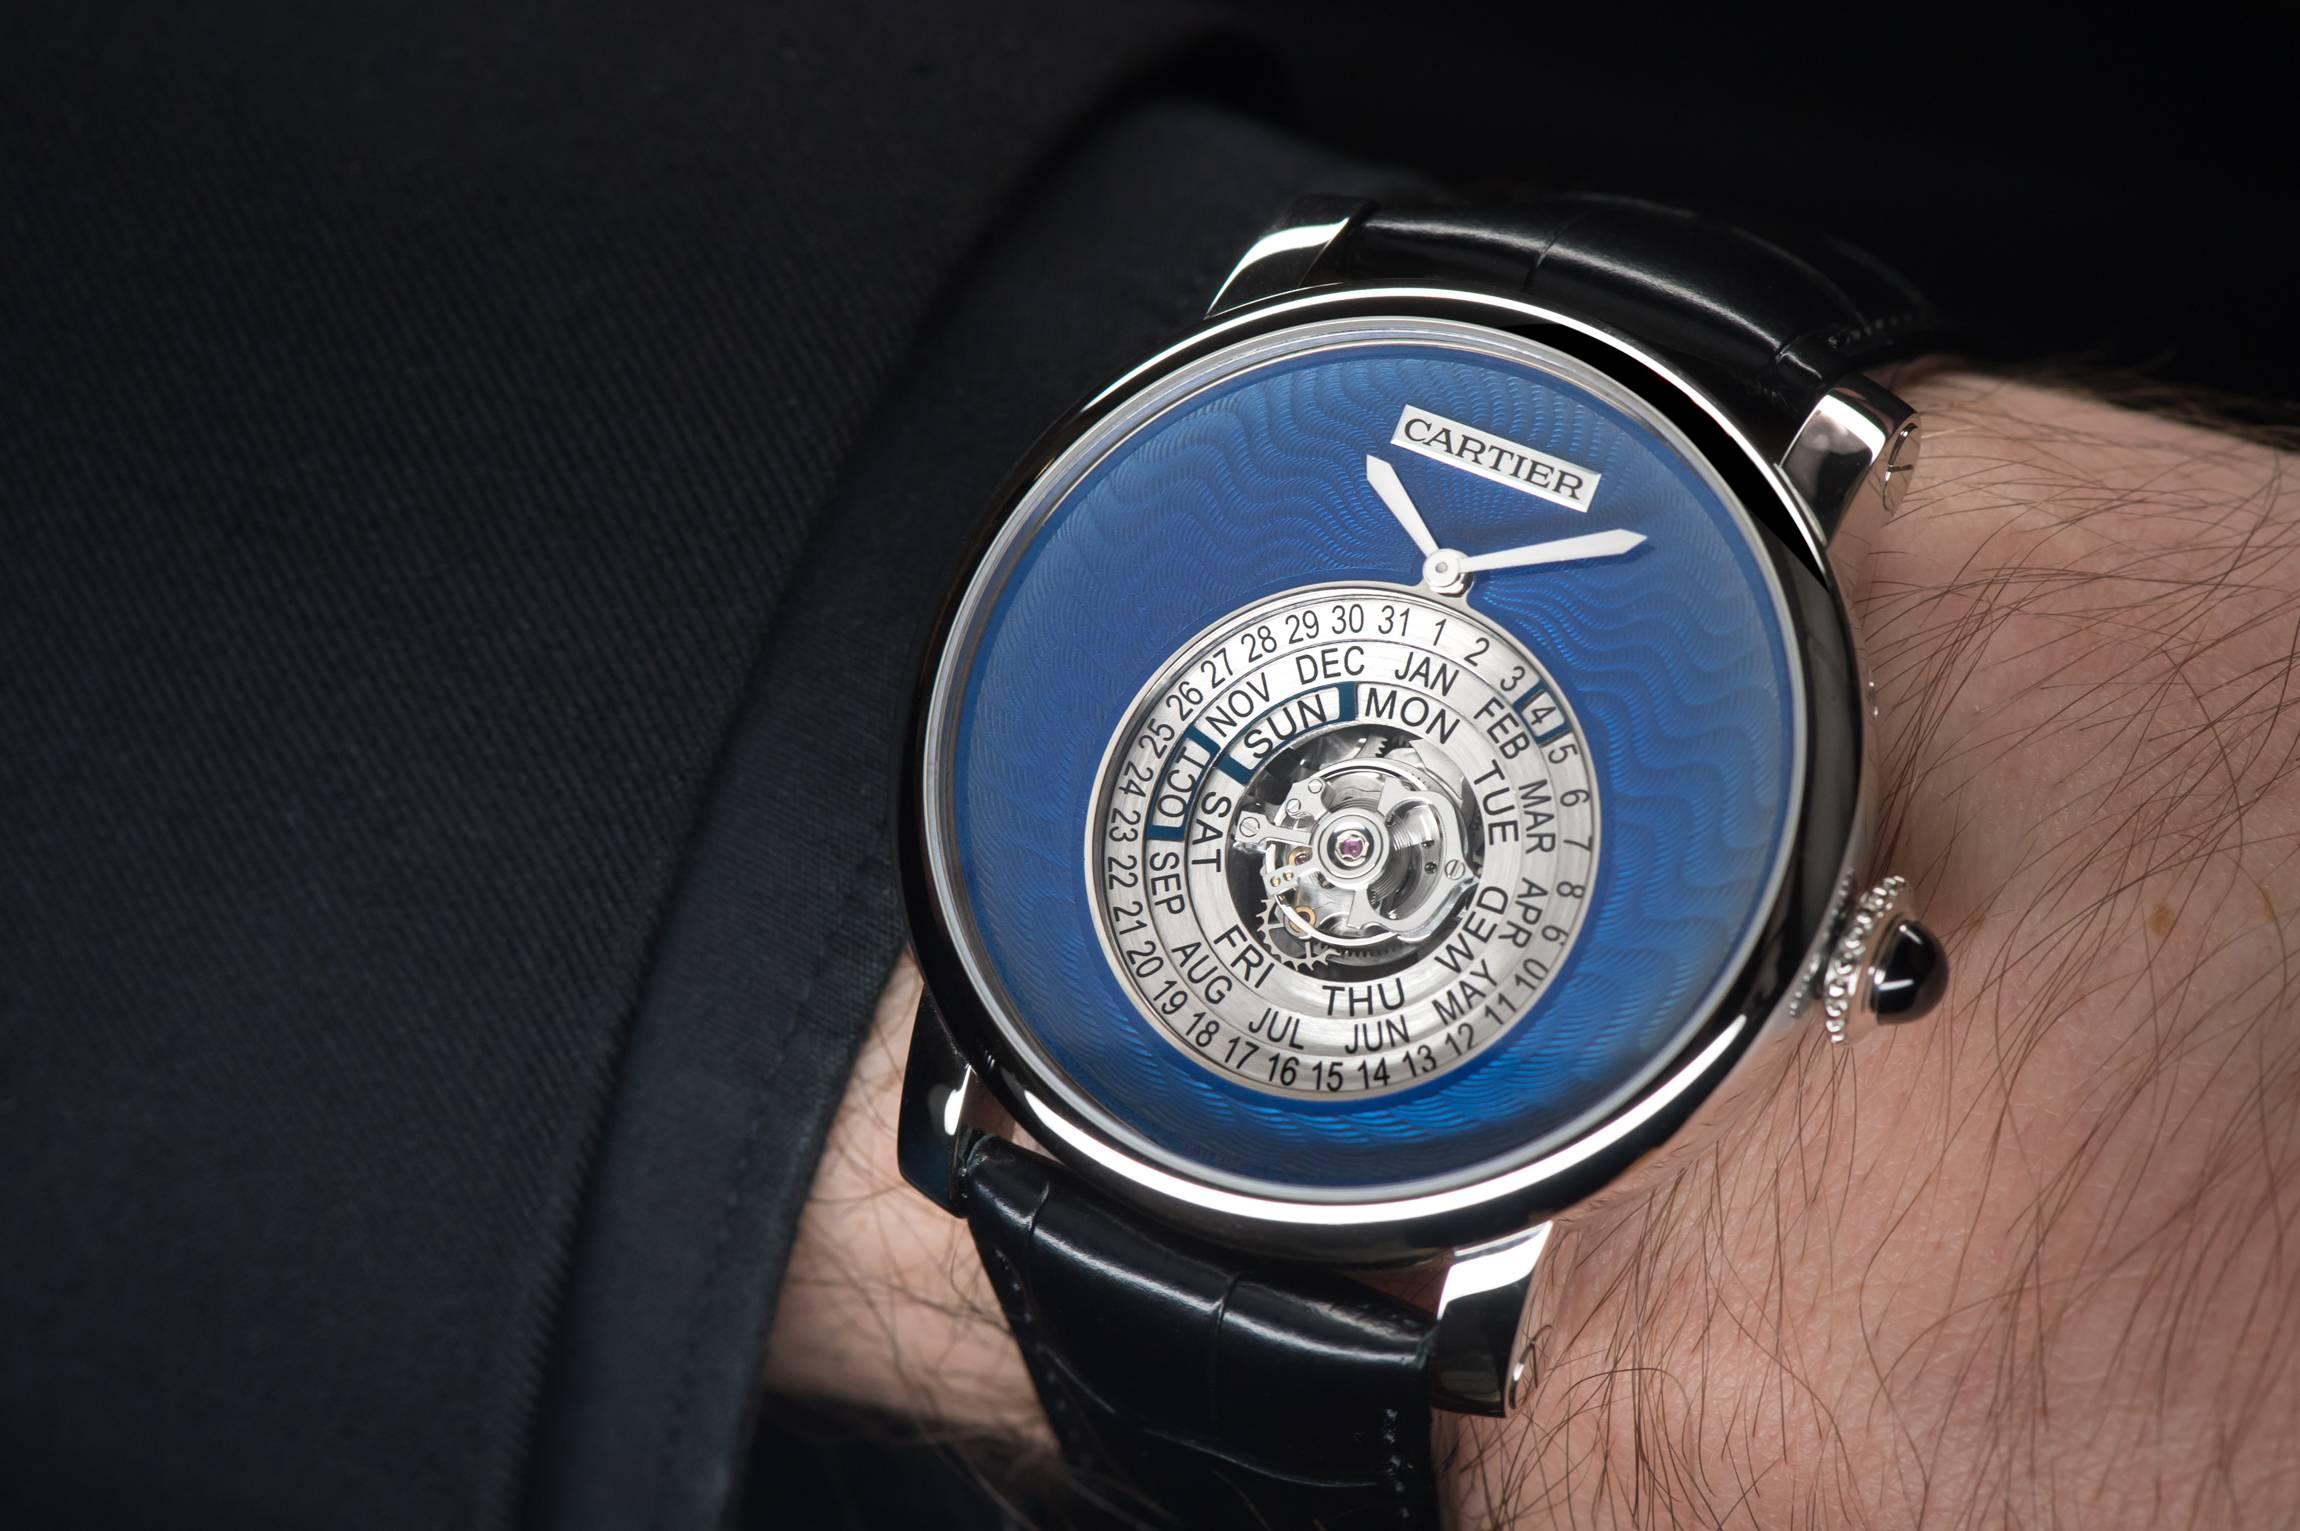 "Cartier Rotonde de Cartier Astrocalendaire, Tourbillon complication, perpetual calendar with circular display Calibre 9459 MC ""Poinçon de genève"" certified watch wrist"